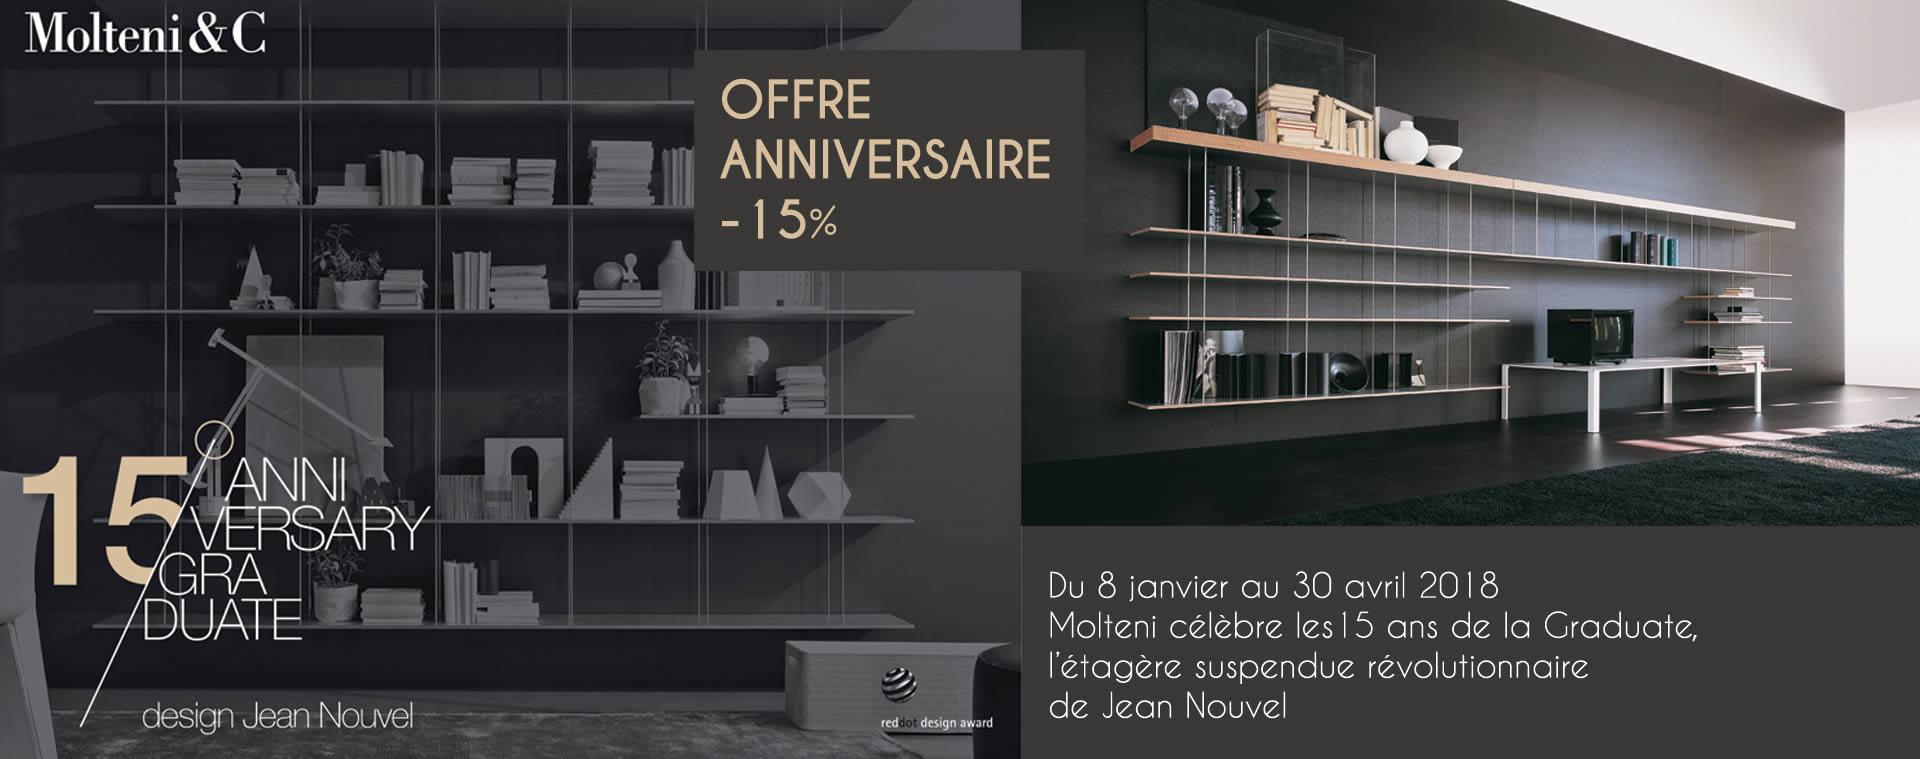 magasin de meuble mulhouse et environ beautiful magasin. Black Bedroom Furniture Sets. Home Design Ideas